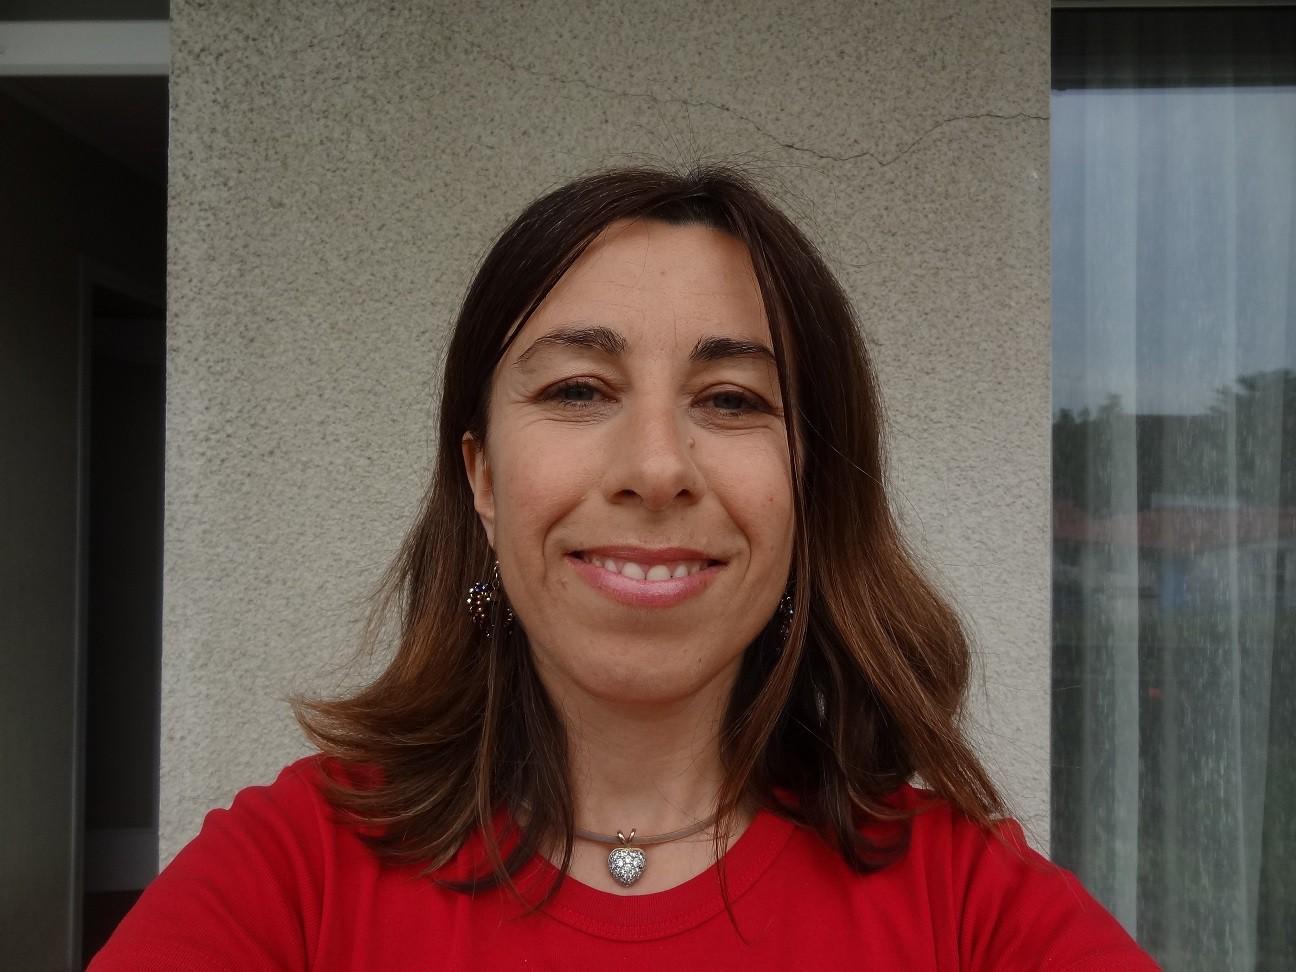 Nathalie Sabia